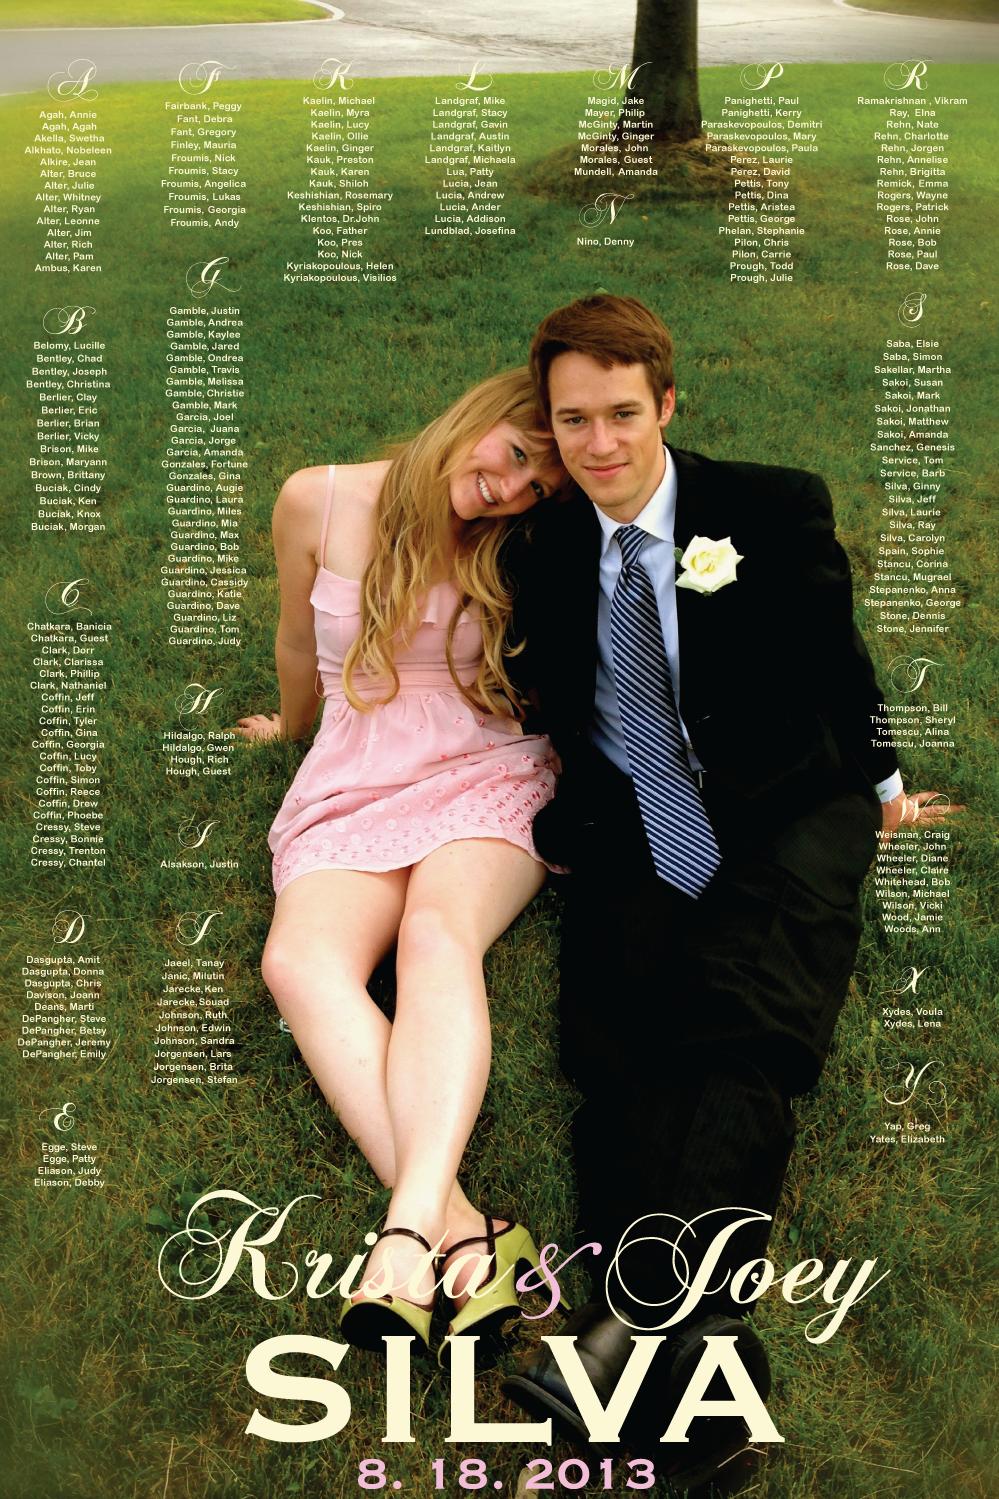 Wedding seating chart for wedding reception printable diy